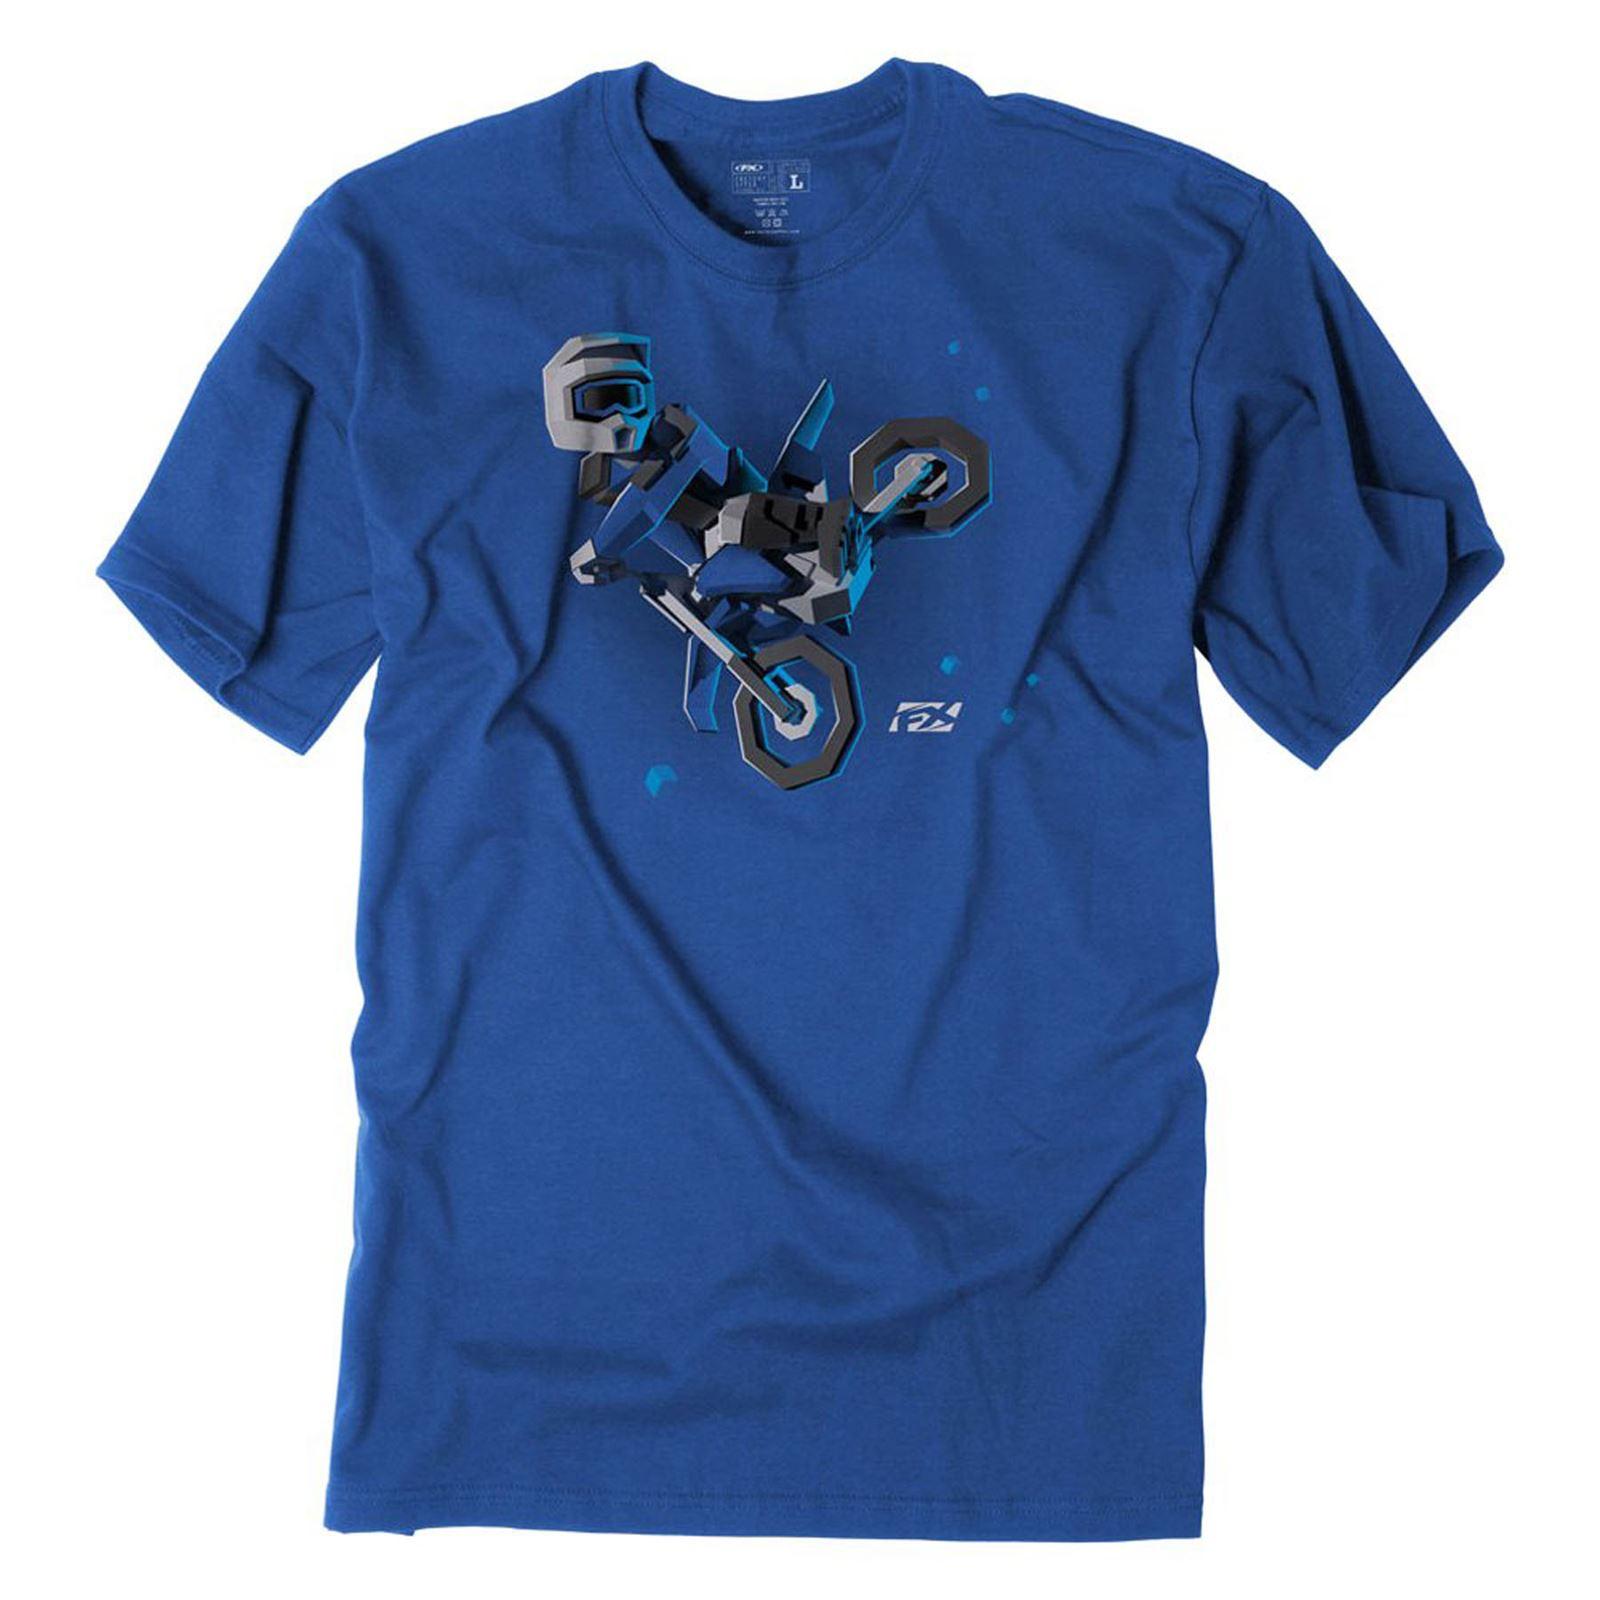 Factory Effex Youth FX Moto Kids Tee Shirt - Royal X-Large